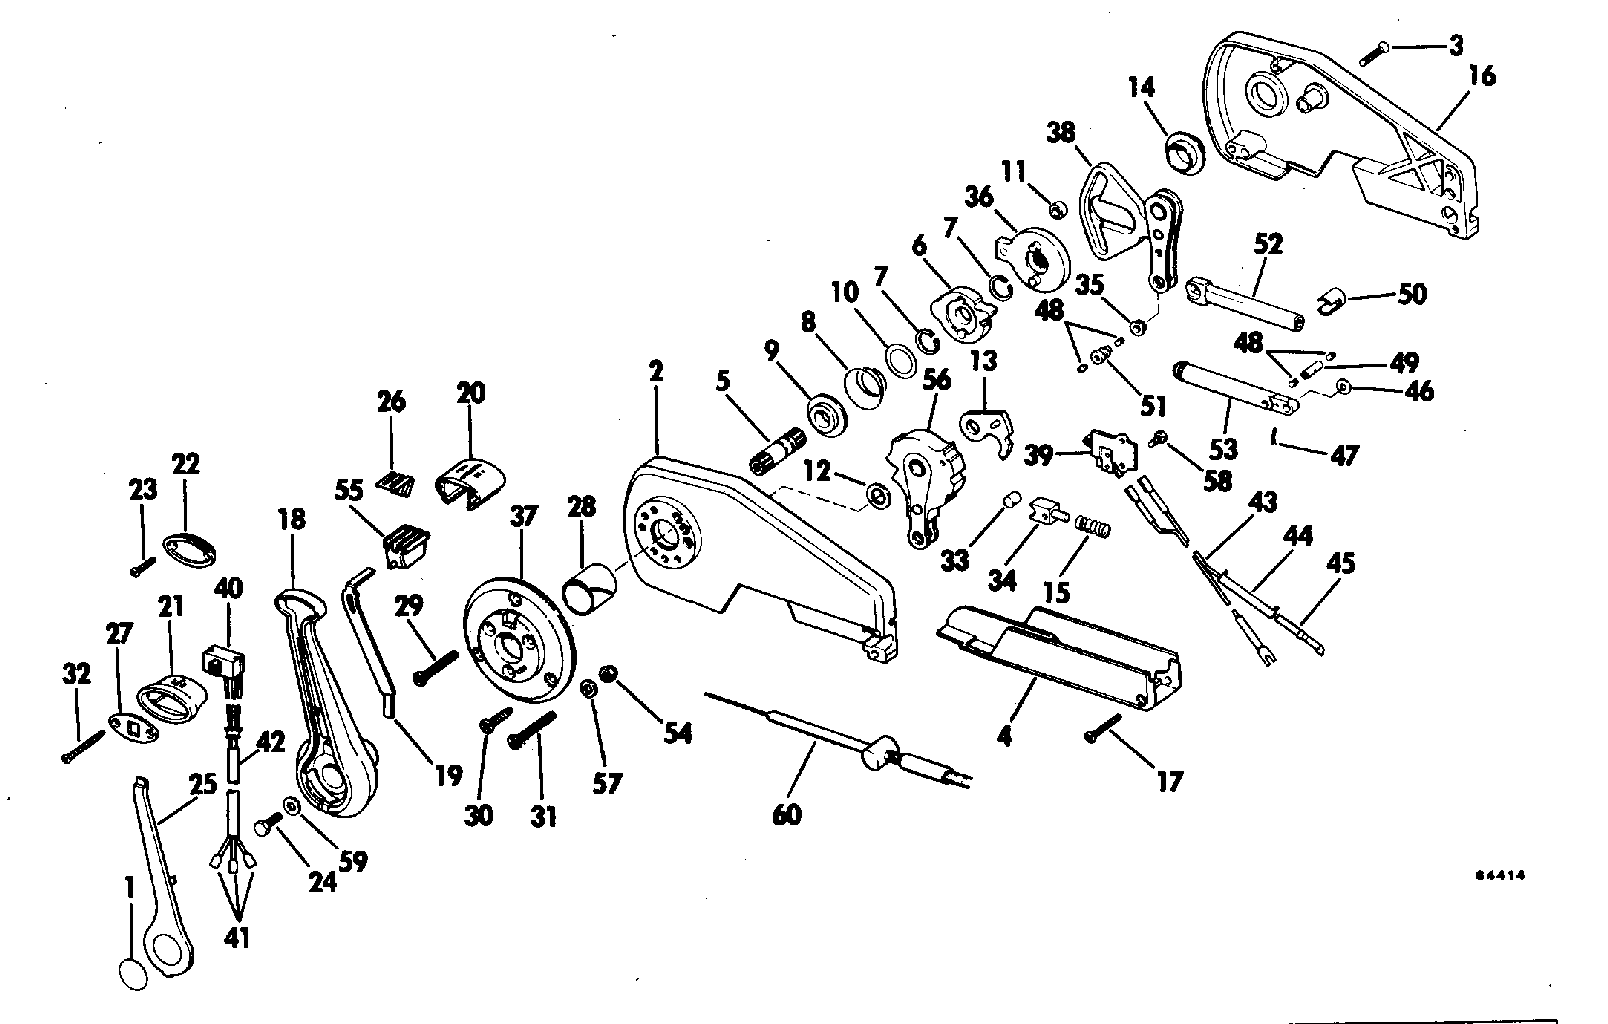 Omc Remote Control Parts Diagram | Wiring Diagram Database